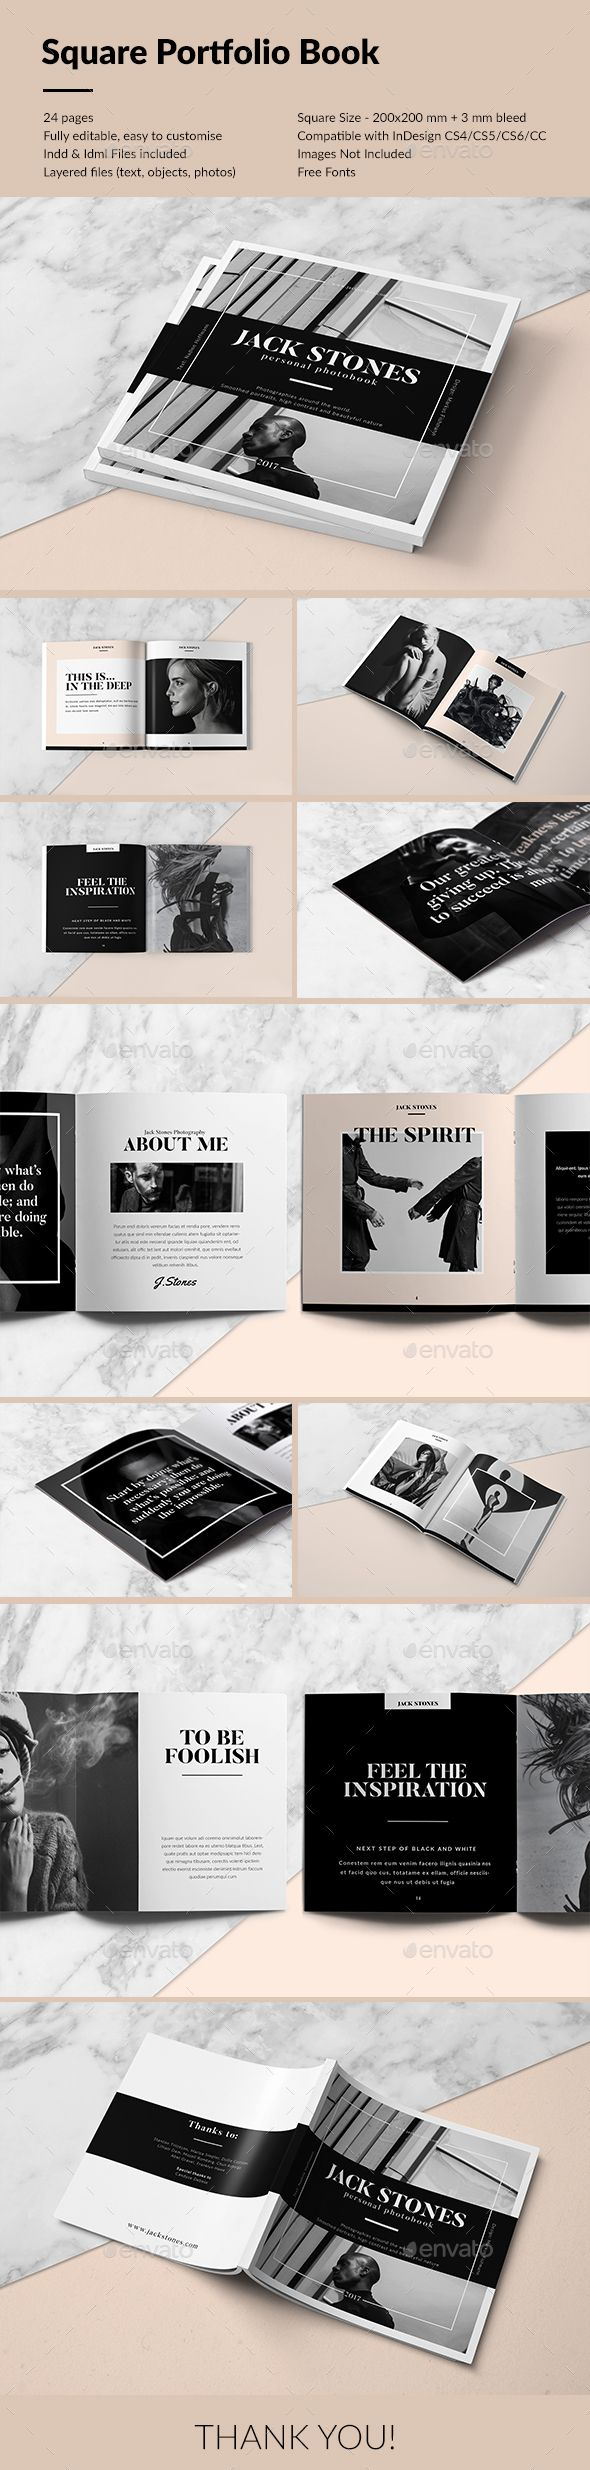 Square Portfolio Book Template InDesign INDD. Download here: http://graphicriver.net/item/square-portfolio-book/15918450?ref=ksioks